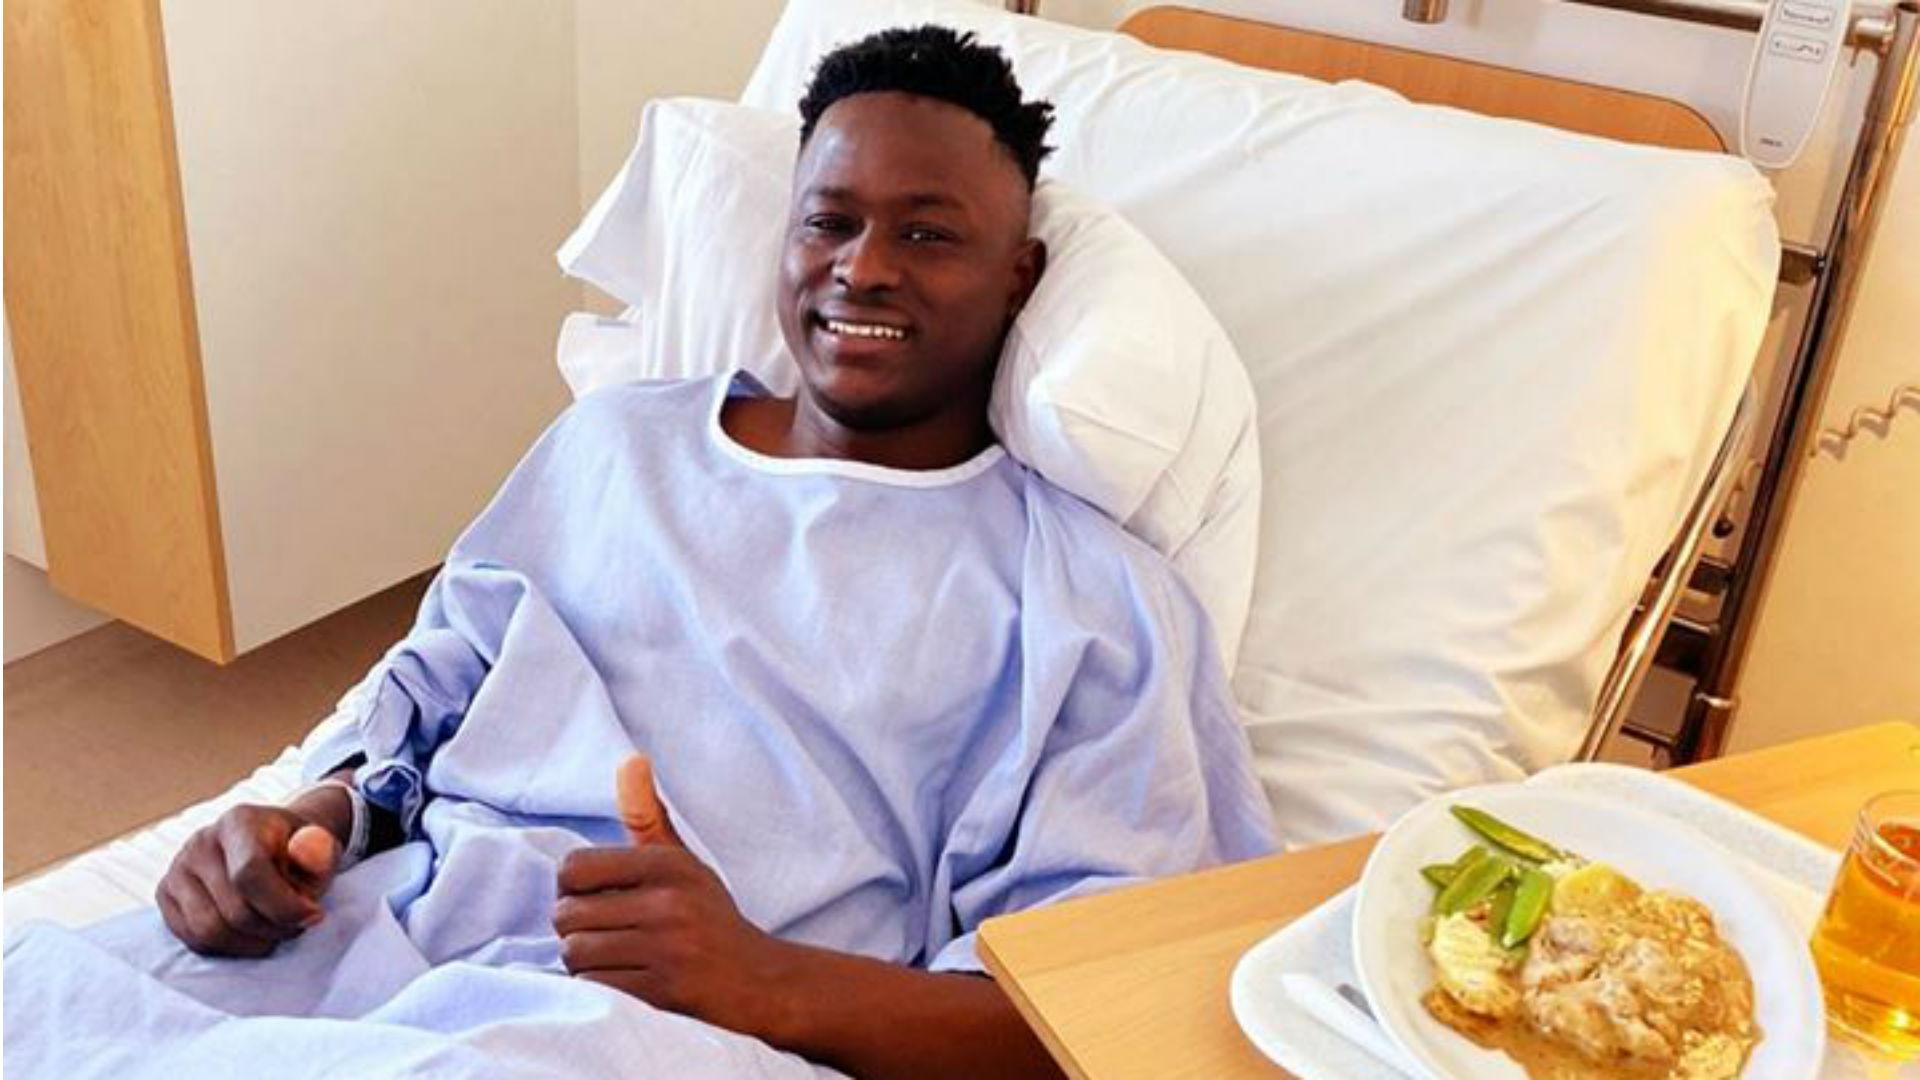 Ouma: Harambee Stars defender injured while training with AIK Fotboll